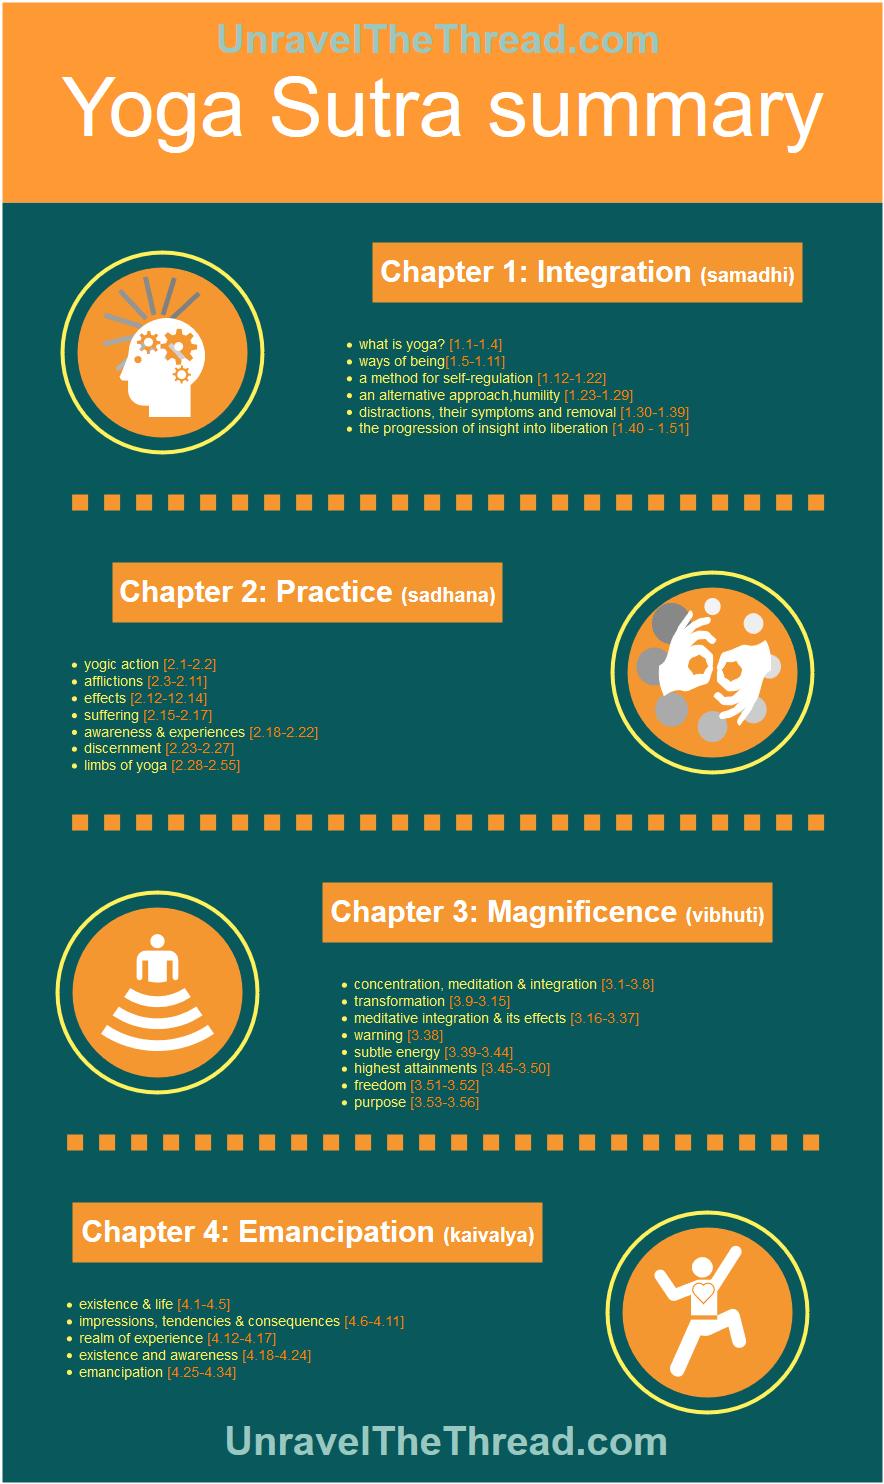 Yoga Sutra Summary Infographic